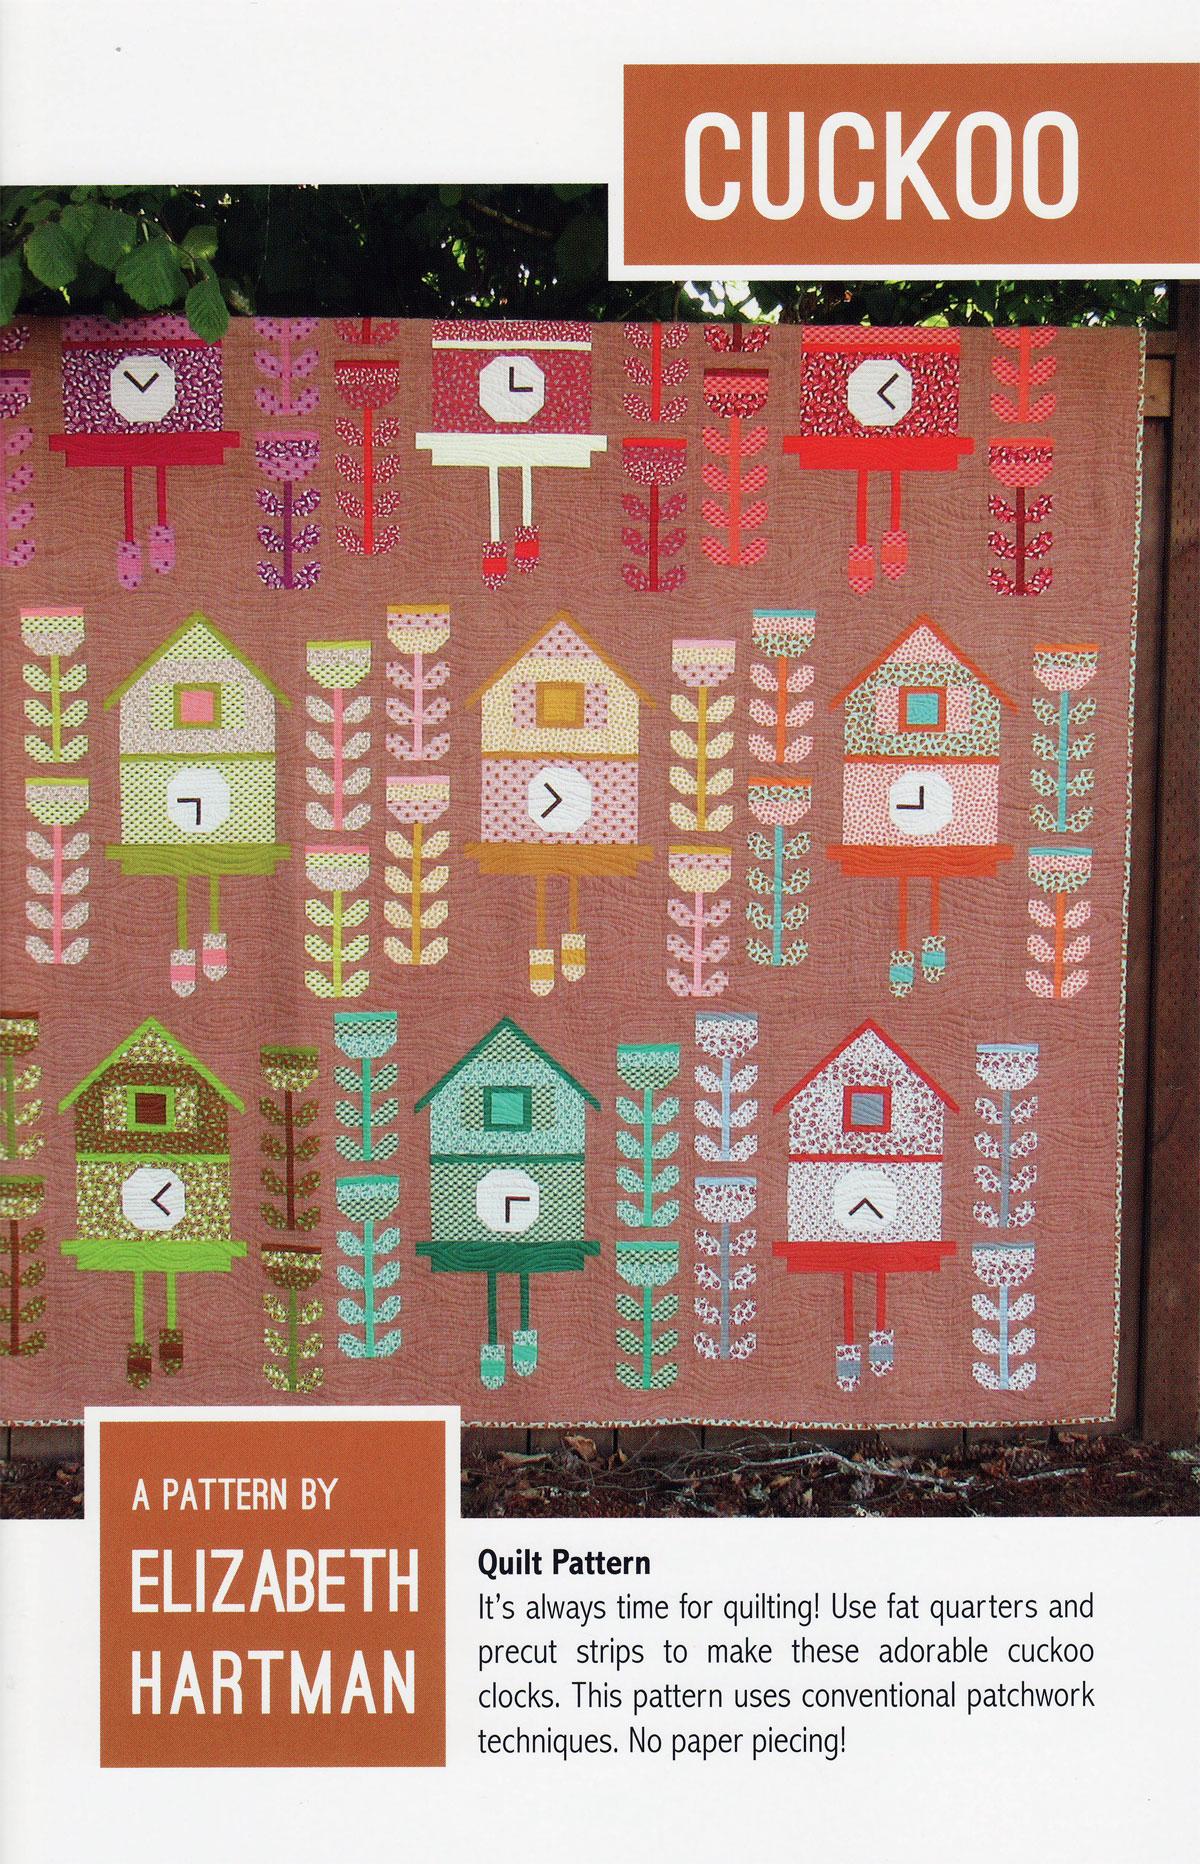 Cuckoo-quilt-sewing-pattern-Elizabeth-Hartman-front